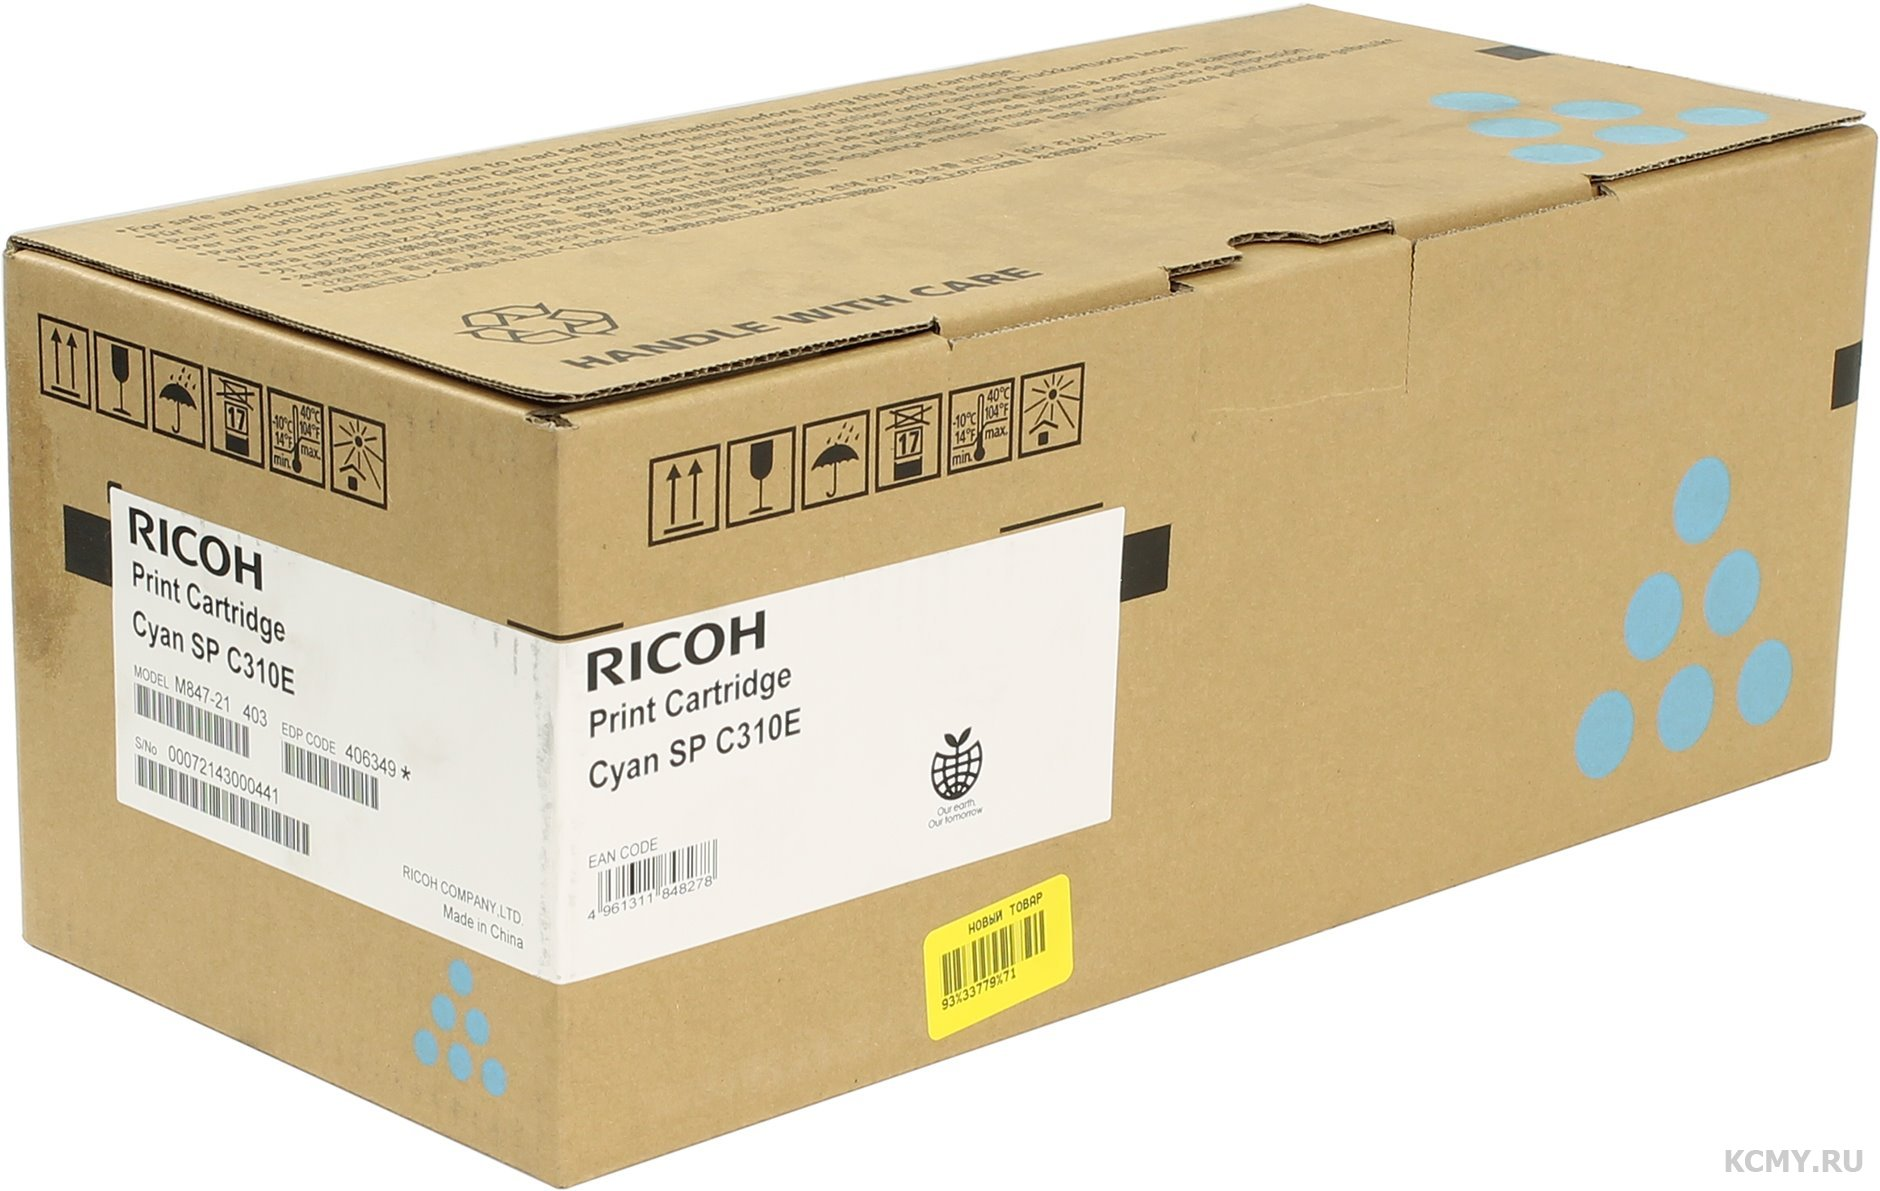 Ricoh SP C310E cyan